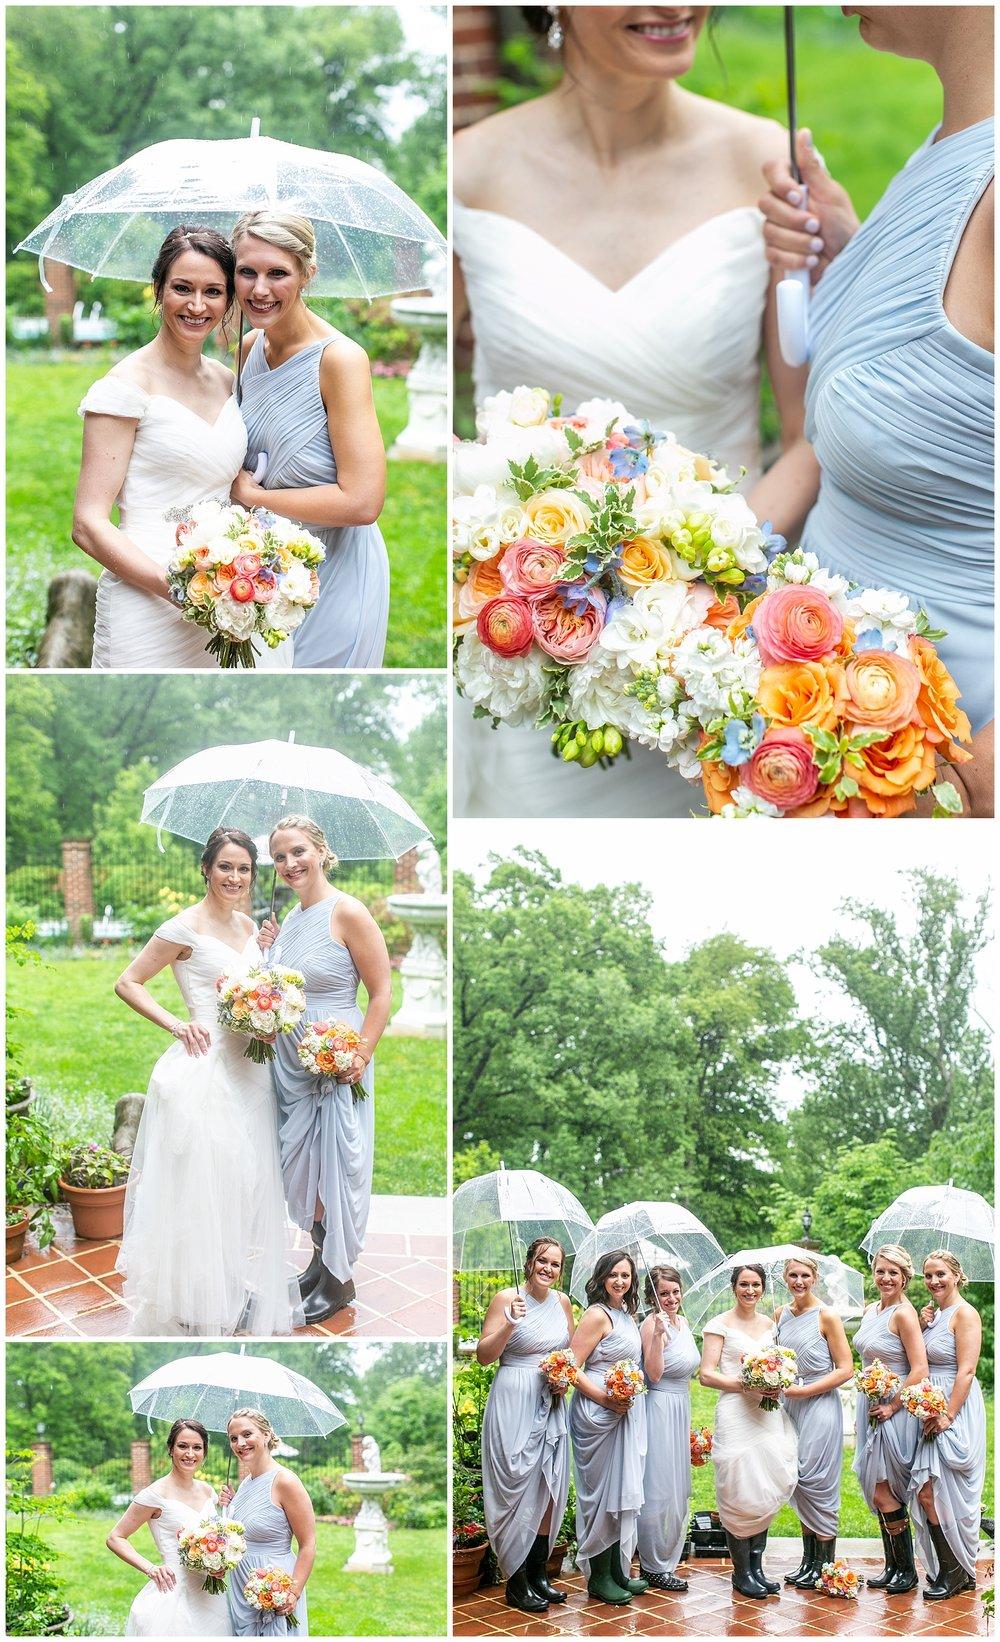 Ashley + Kevin Gramercy Mansion Rainy Day Baltimore Wedding Living Radiant Photography photos_0024.jpg